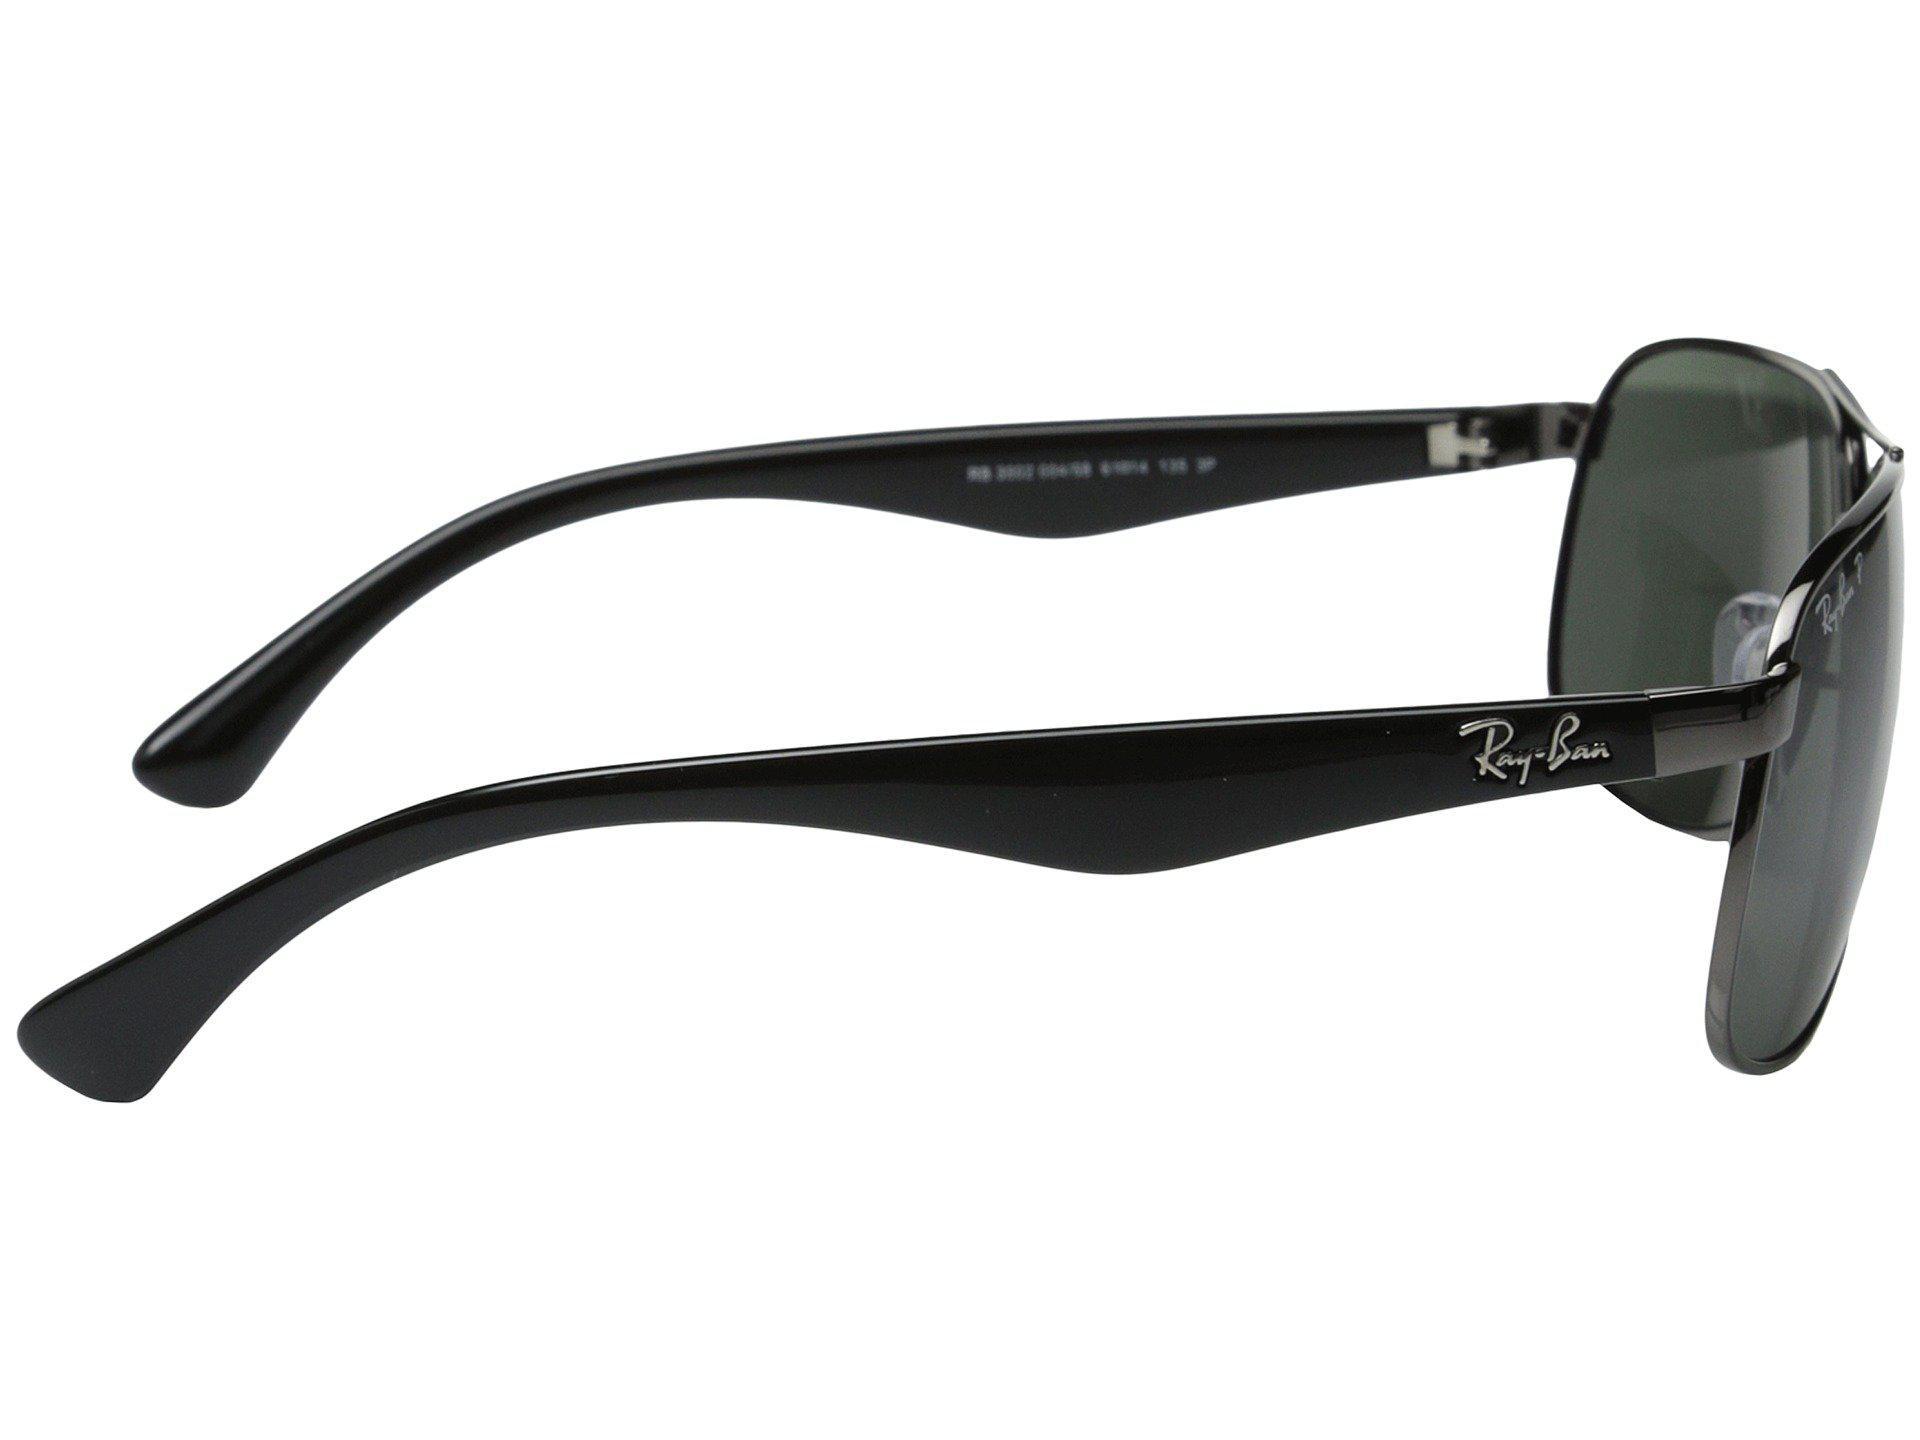 da0a9b0a99 Ray-Ban - Black Rb3502 Polarized 61mm (gunmental polarized) Polarized  Fashion Sunglasses. View fullscreen